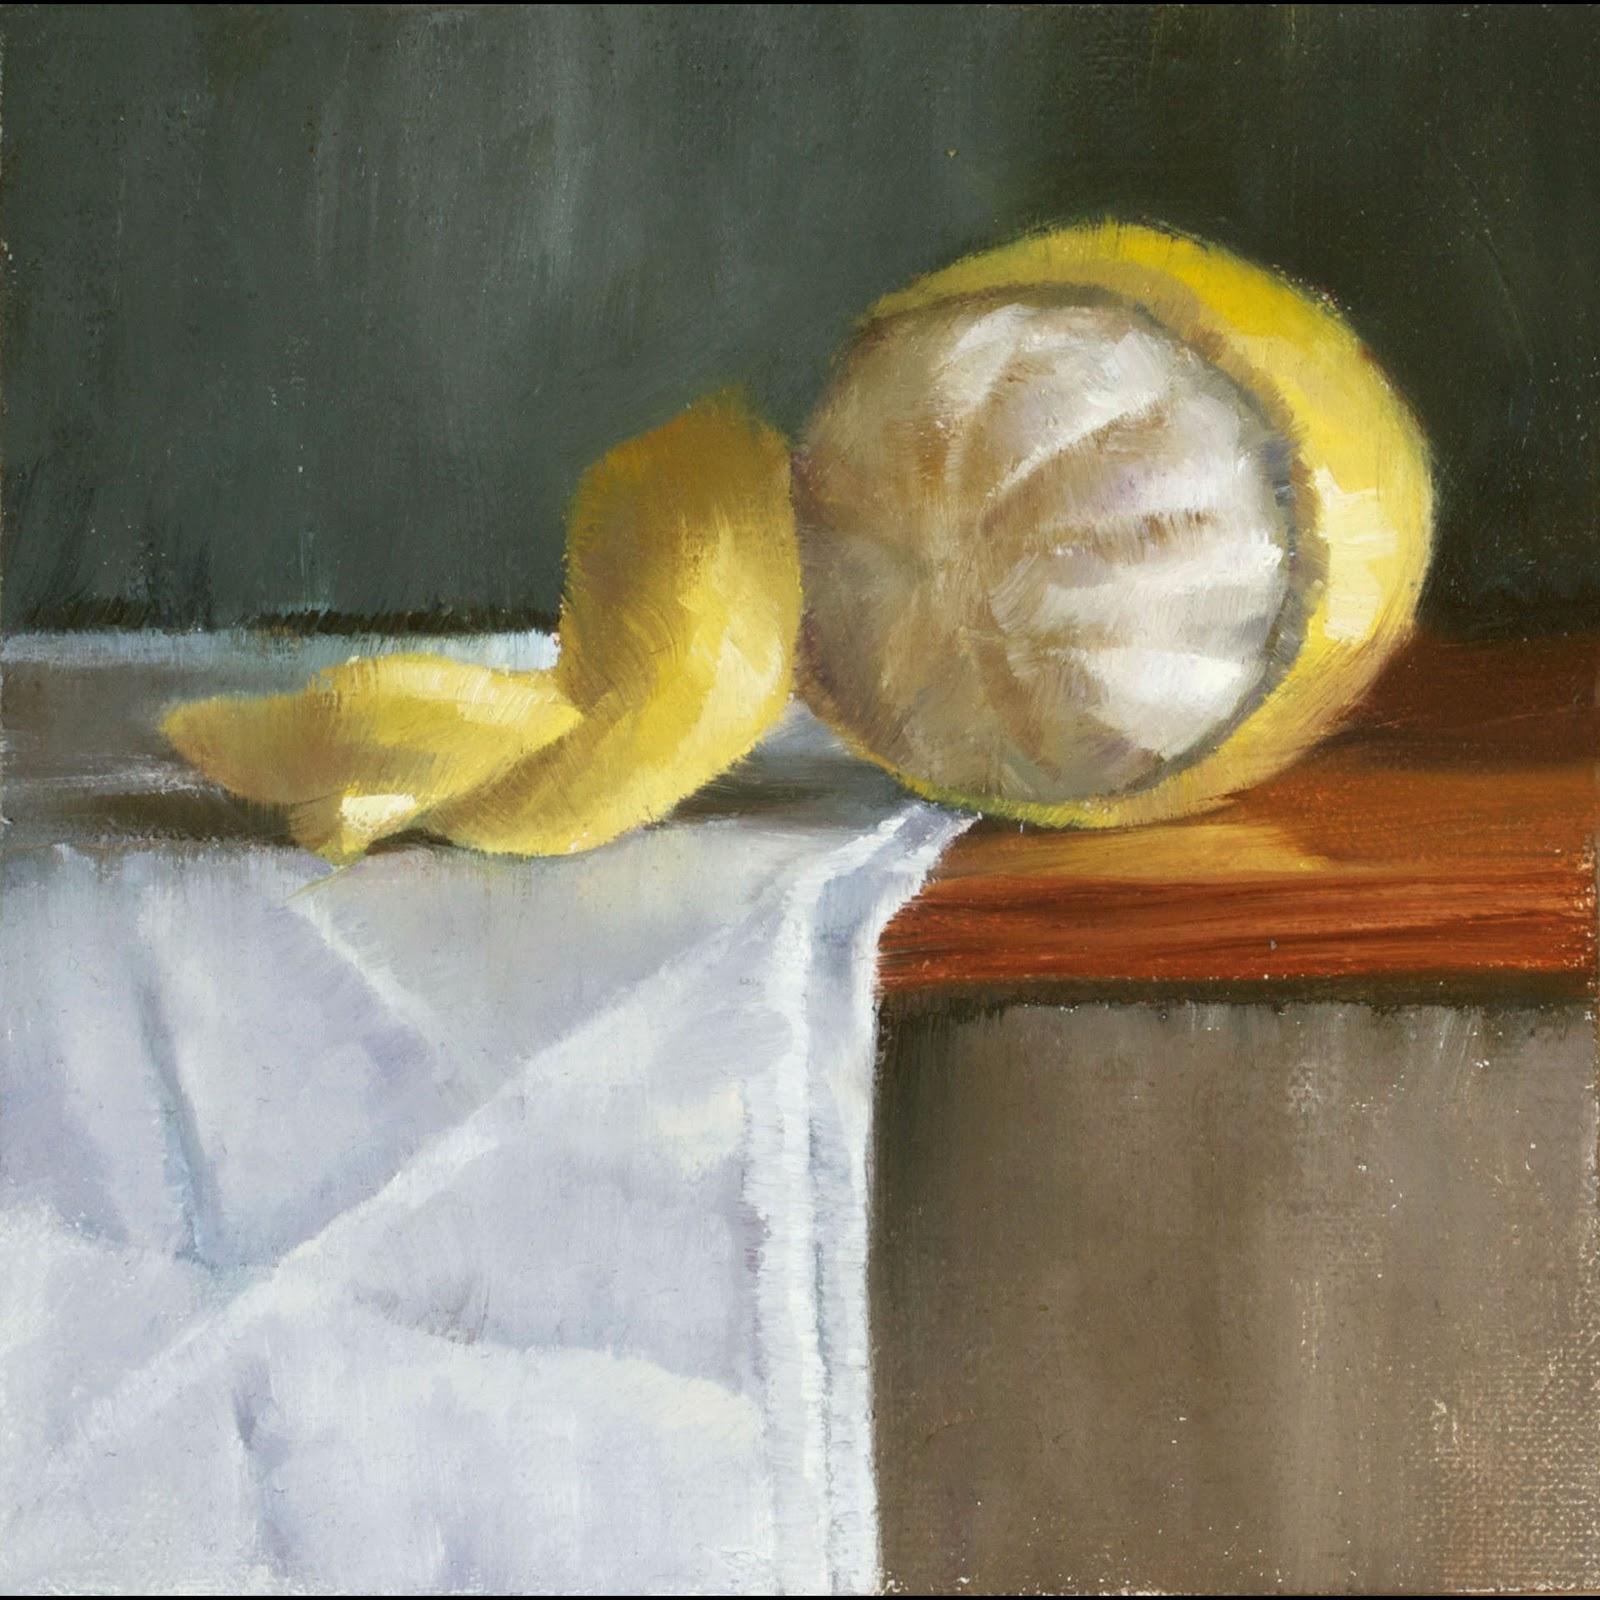 Peeled lemon can be stored